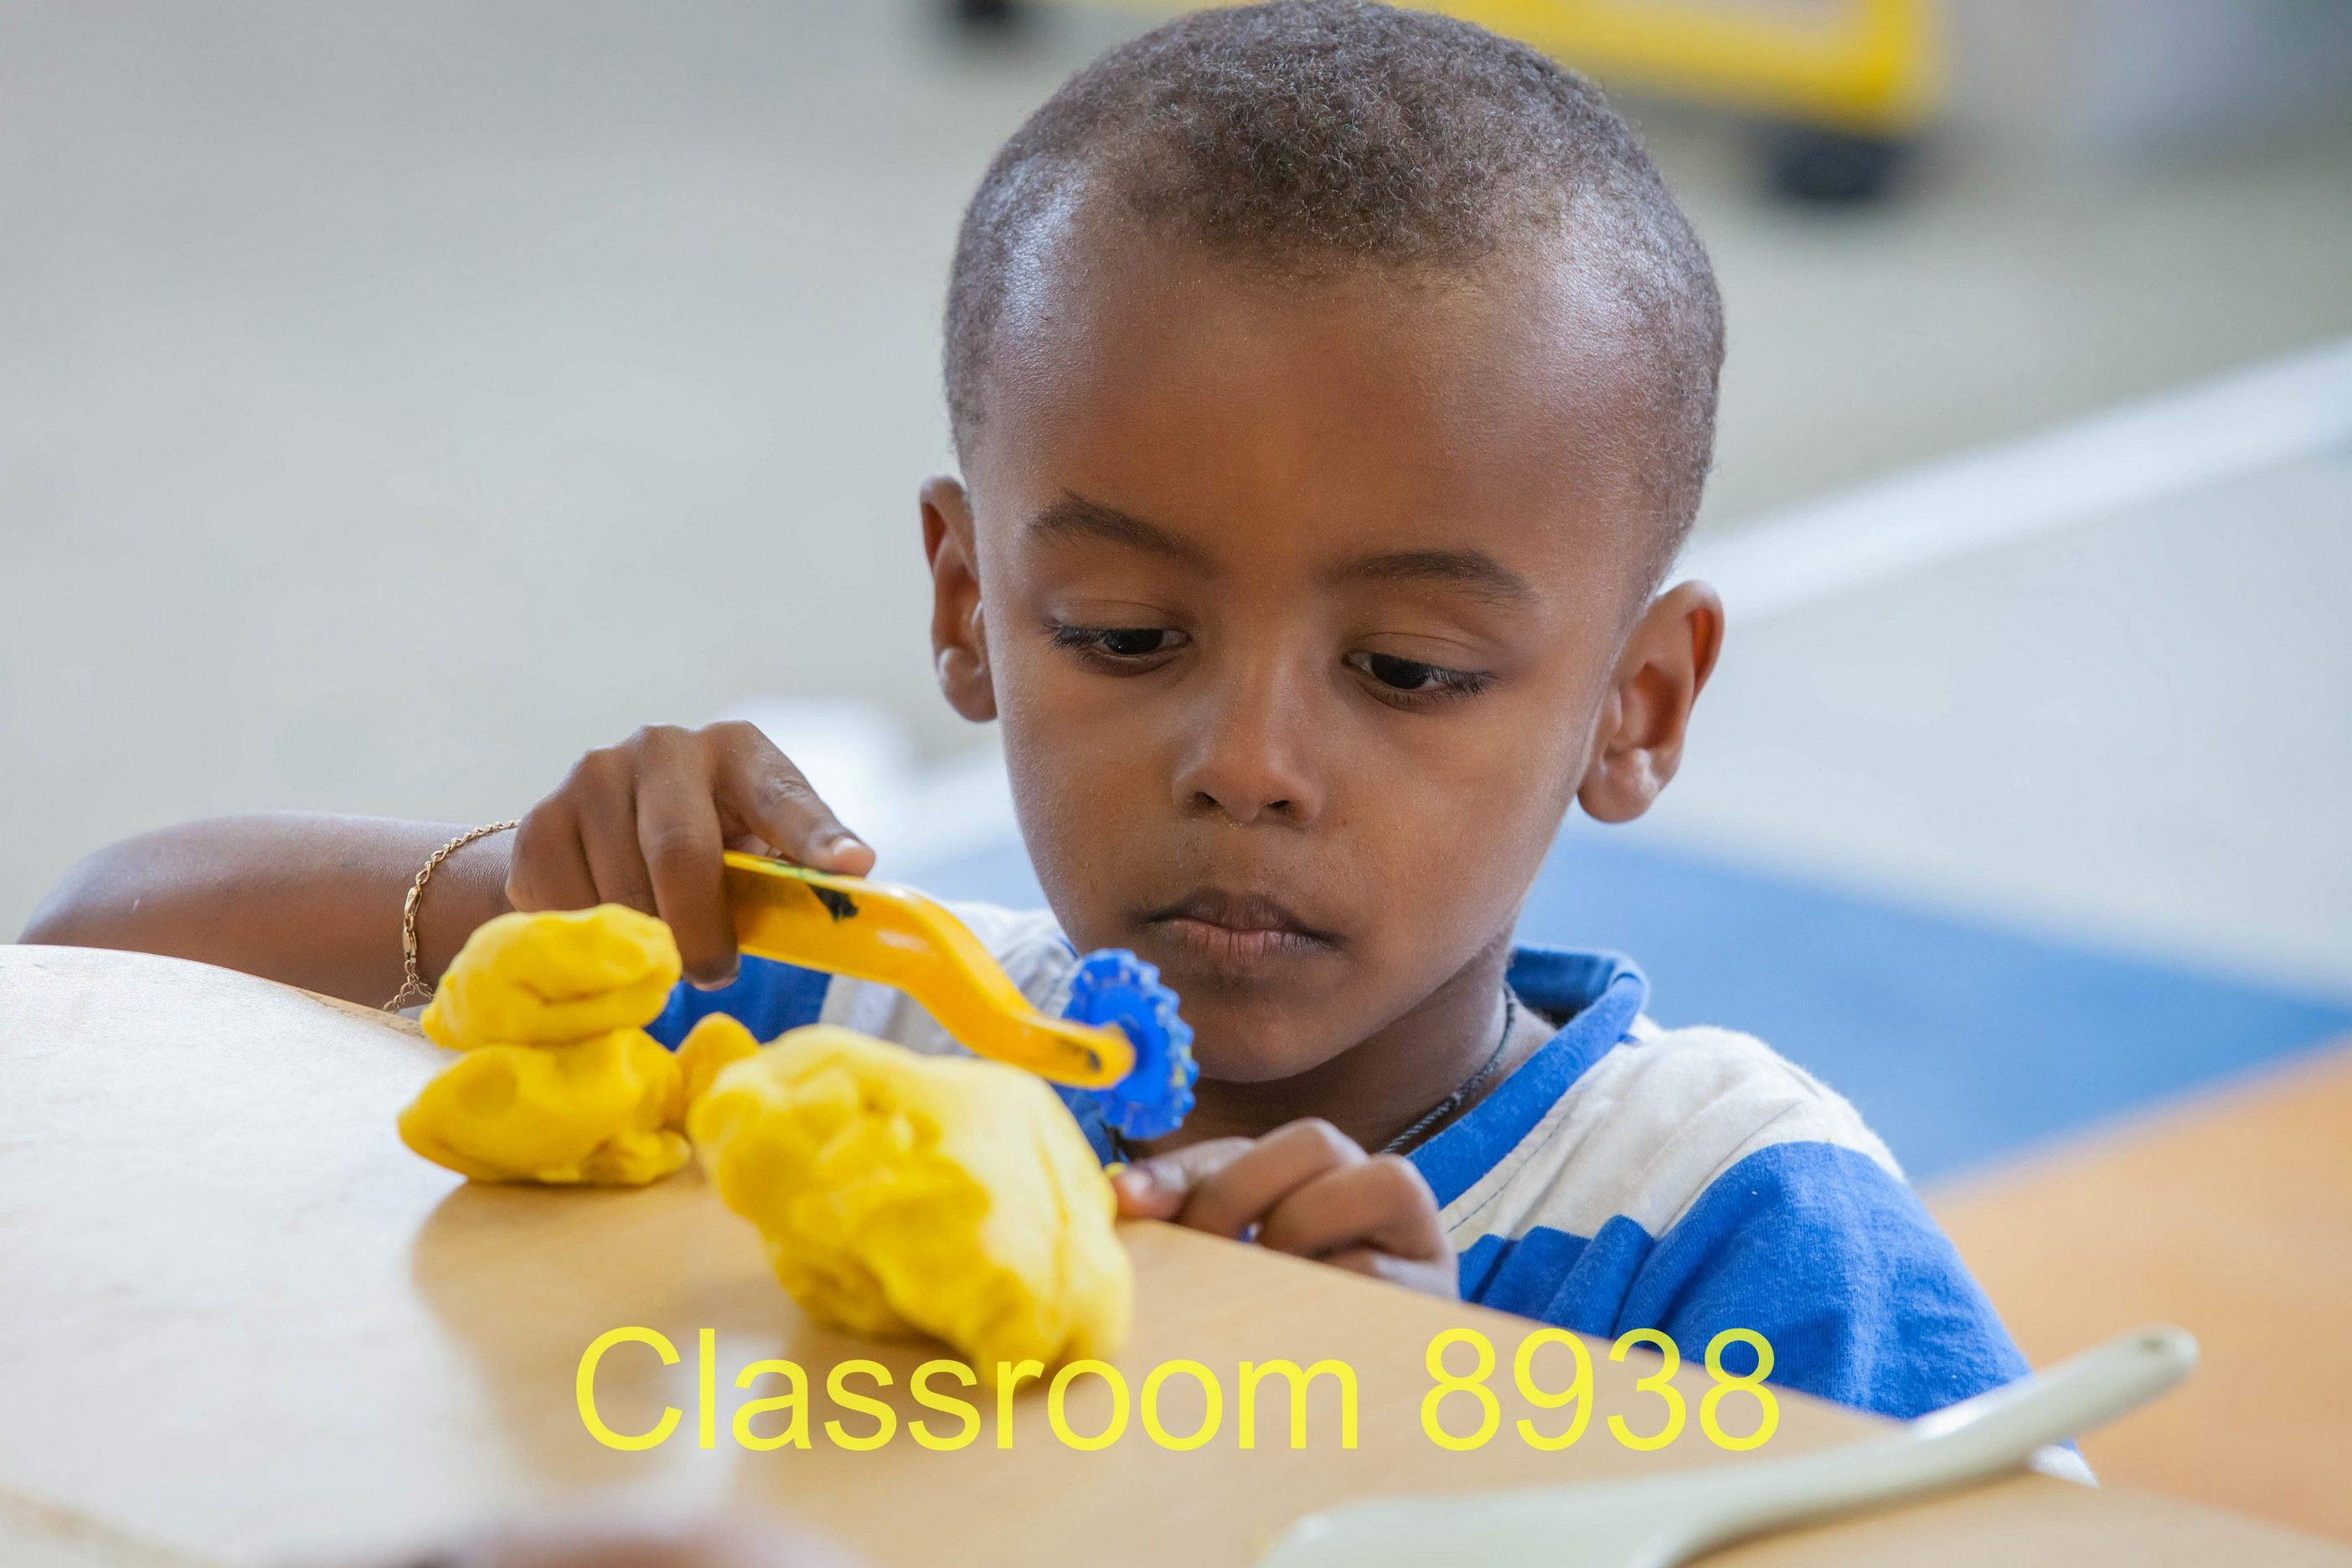 Classroom 8938